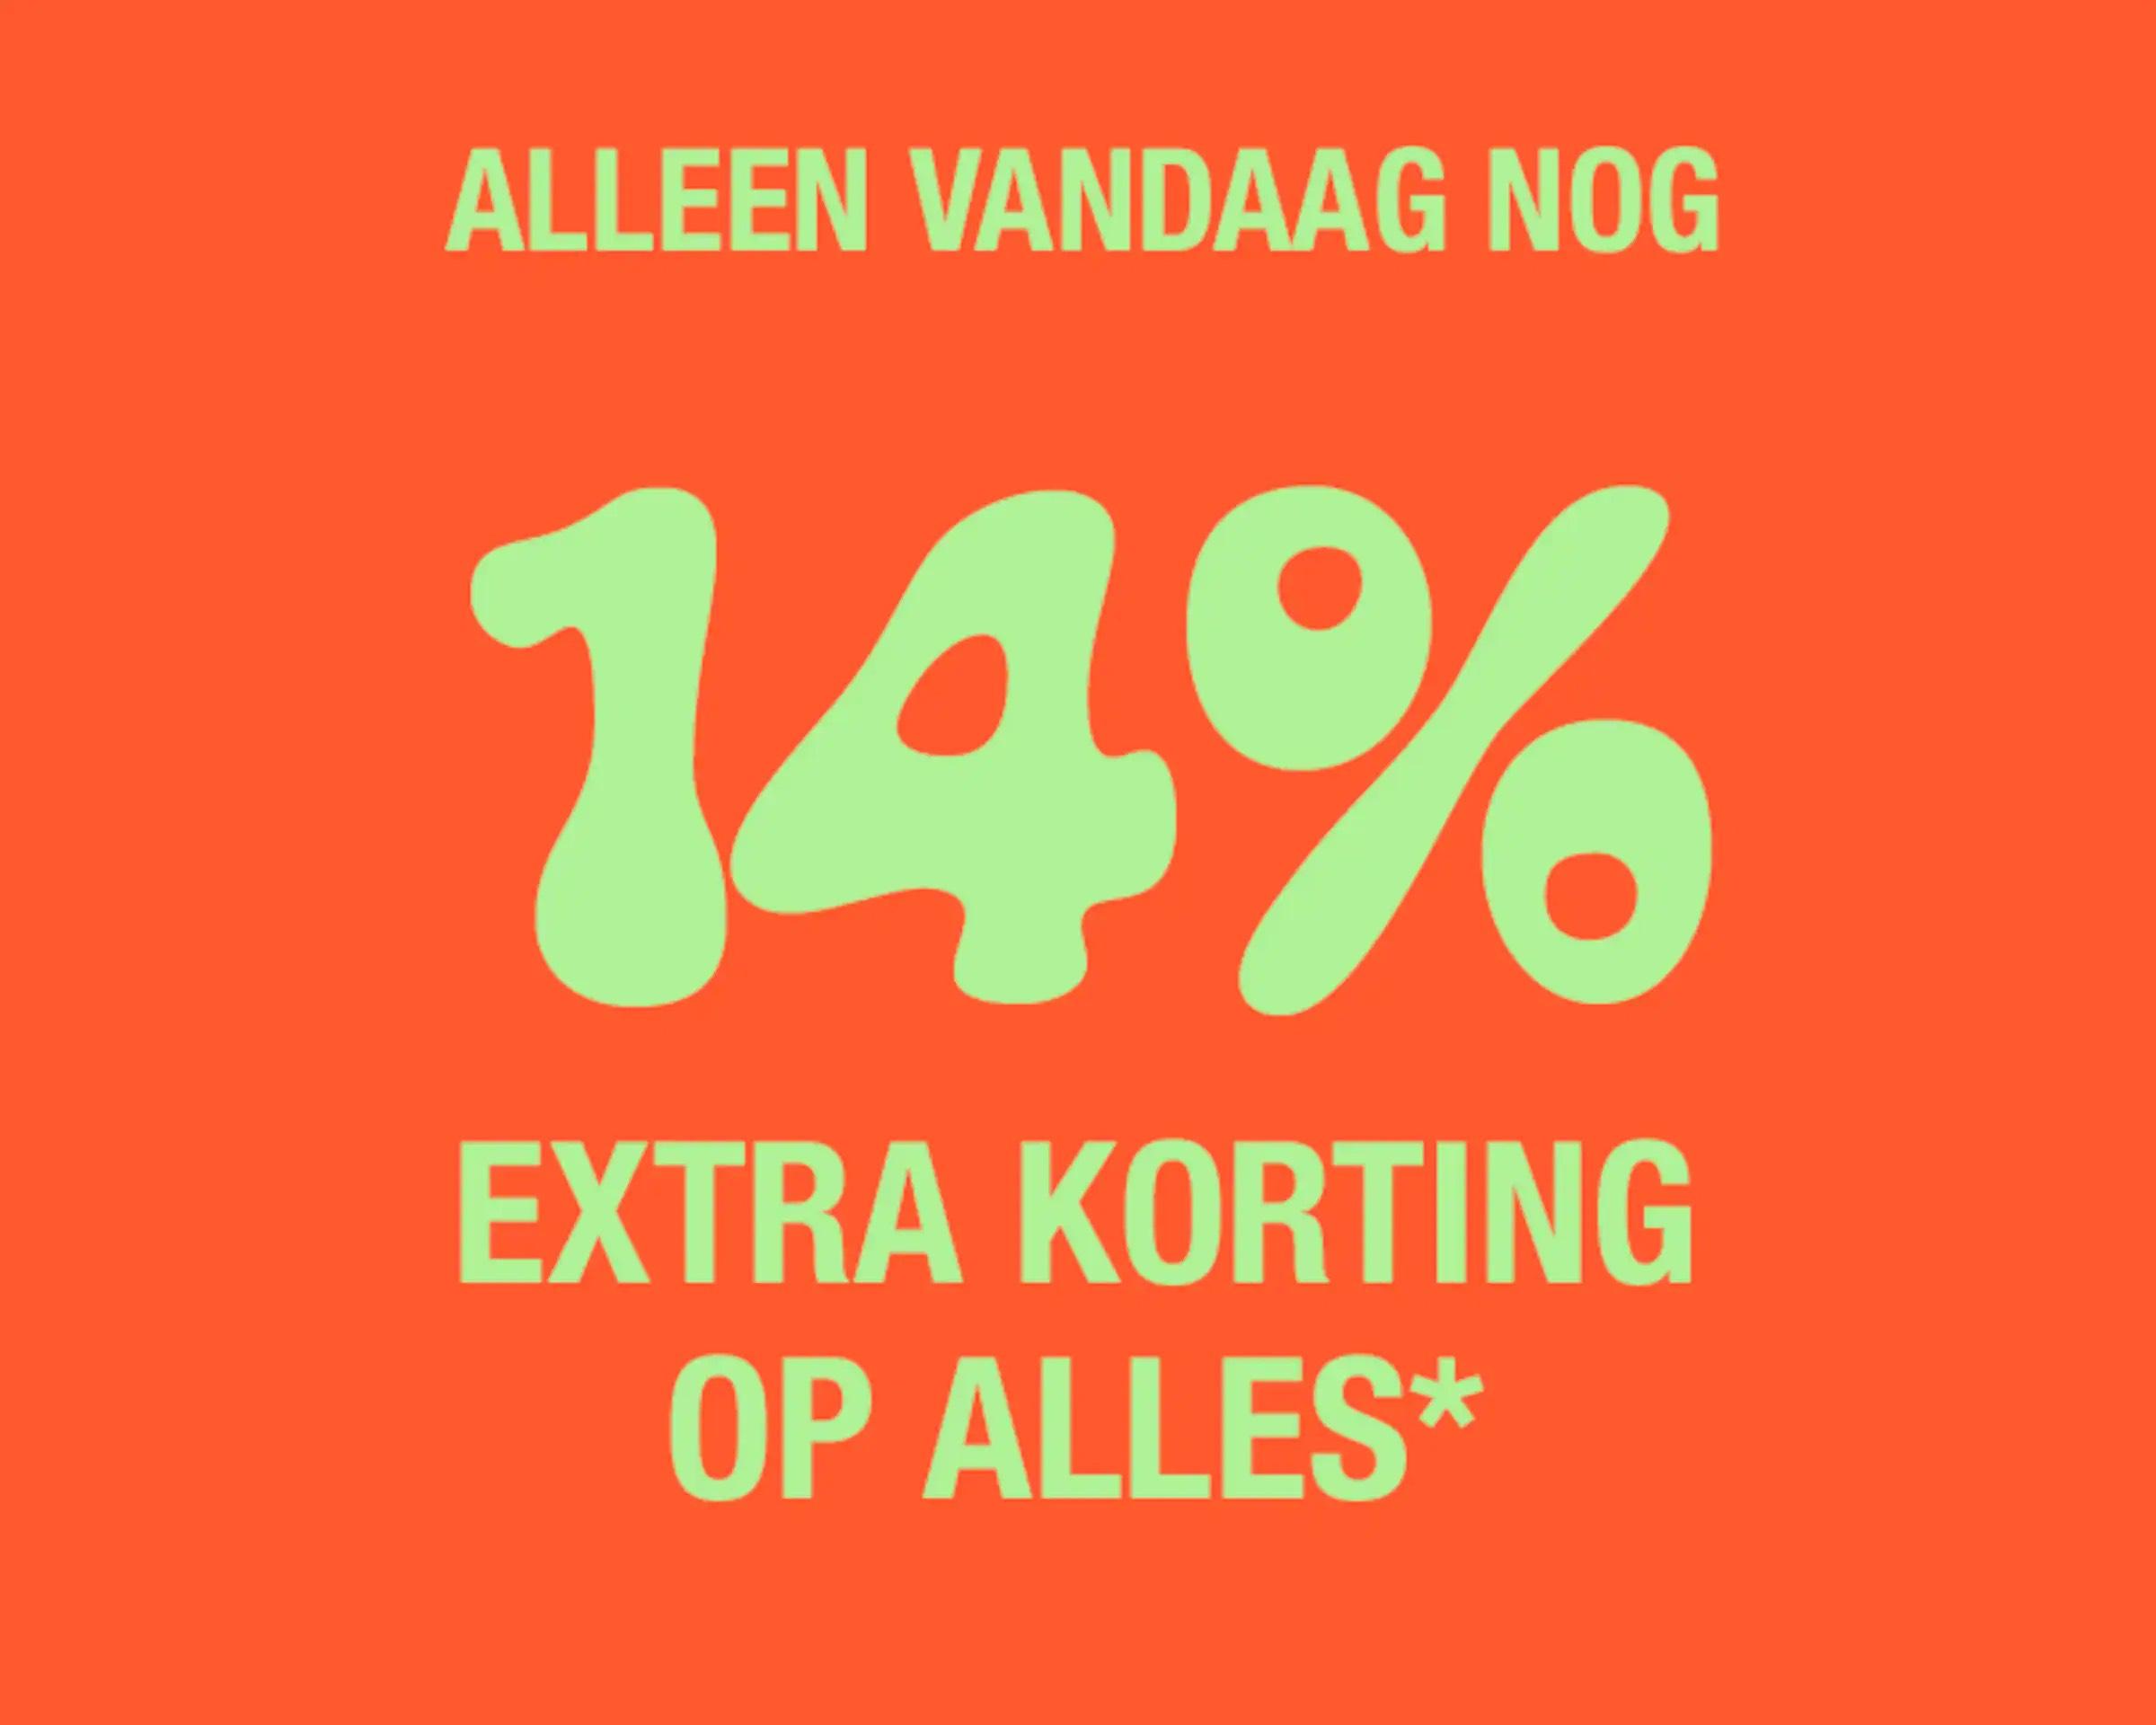 Alleen vandaag: 14% korting op alles (minimale besteding €75) @ About You